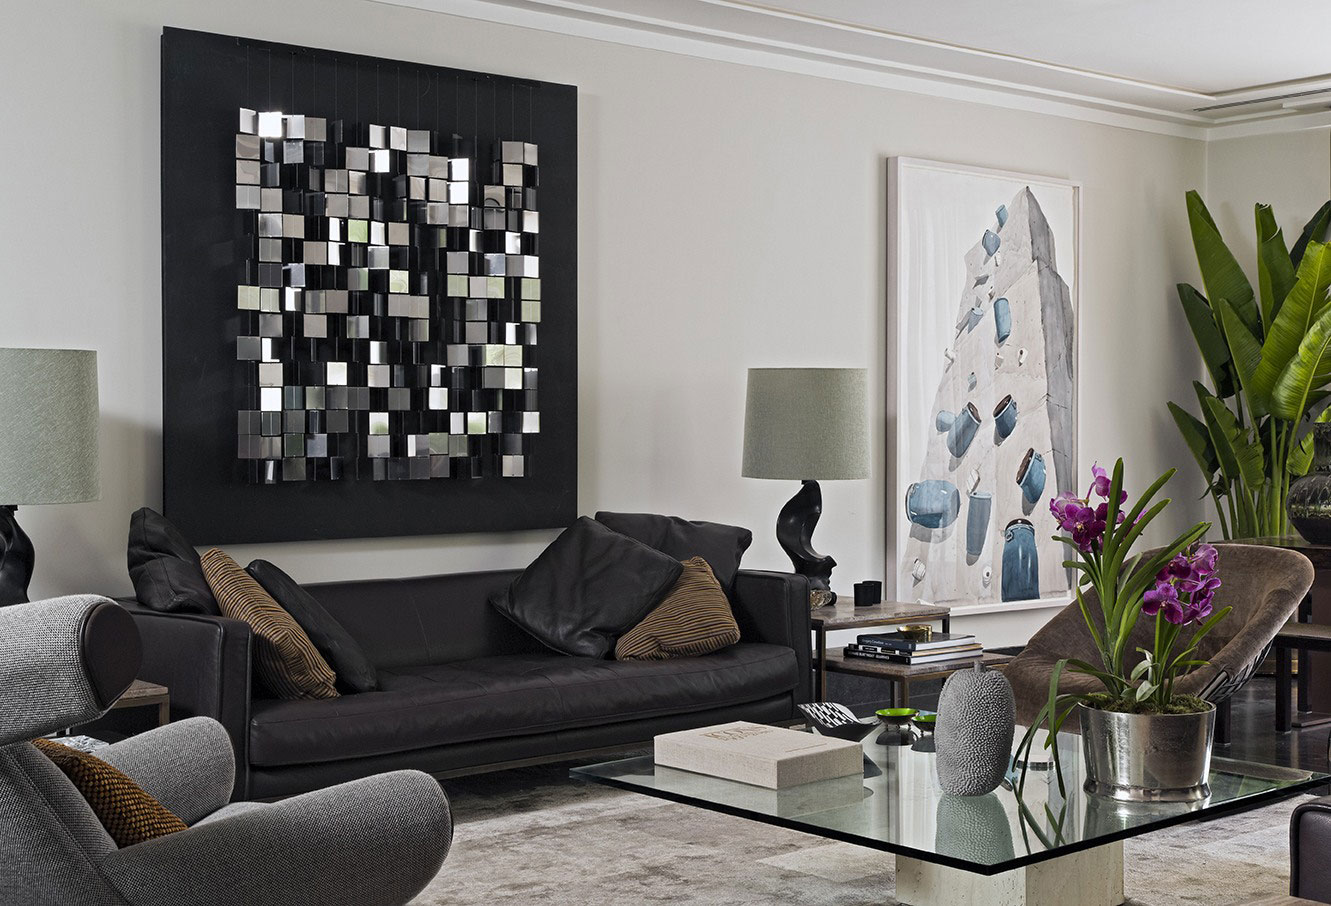 Enchanting Living Room Wall Art Of Lovely Decor Above Black Sofa Glass